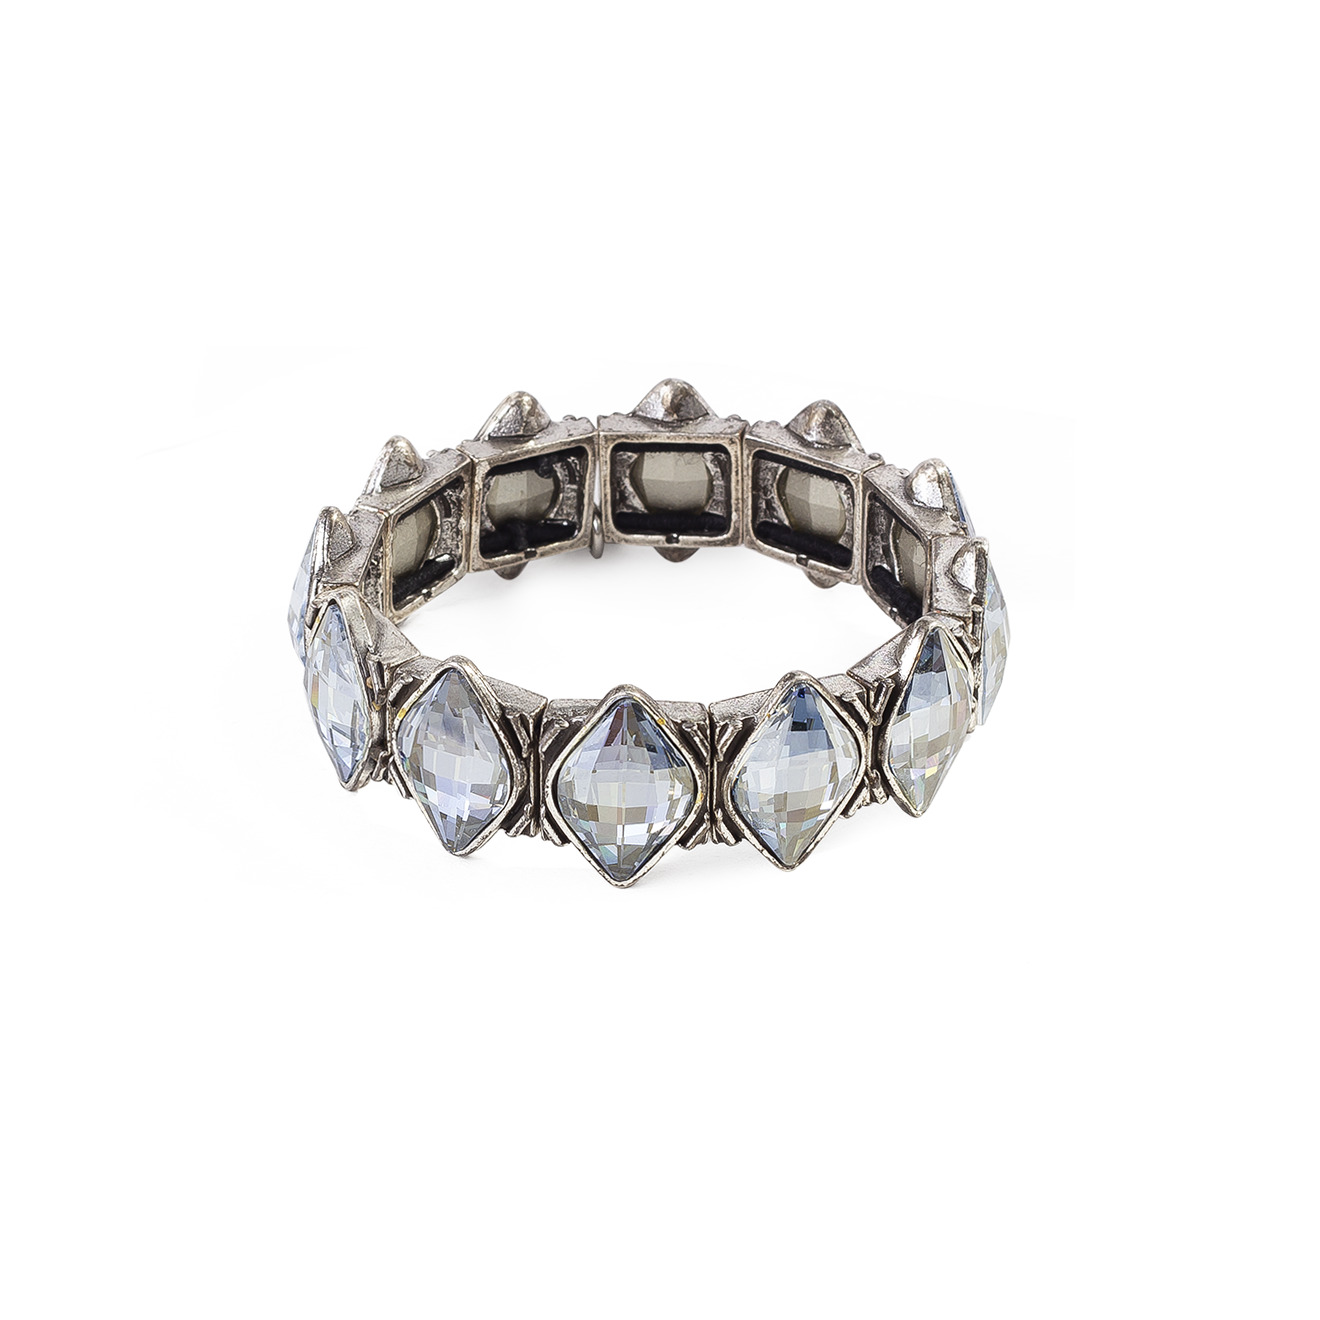 Philippe Audibert Покрытый серебром браслет Lemon Silver Color